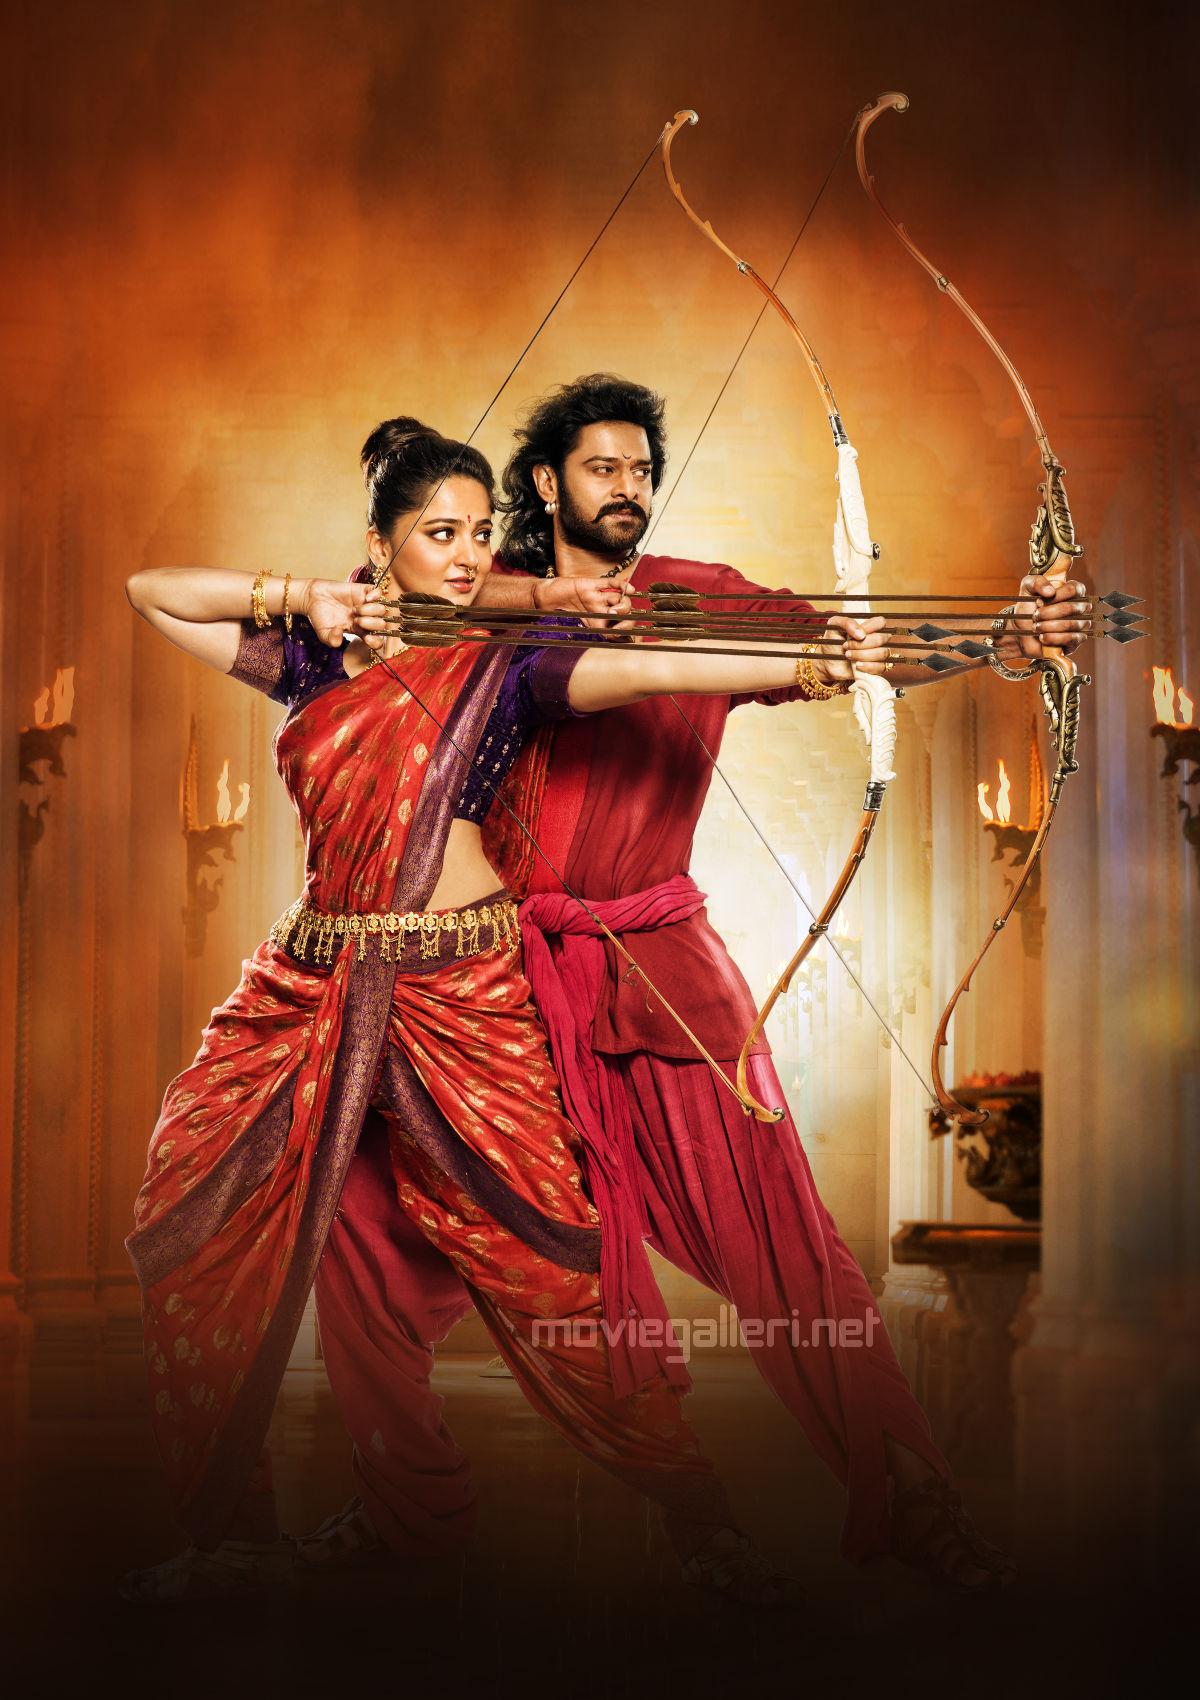 Anushka Prabhas At Baahubali 2 New Movie Posters